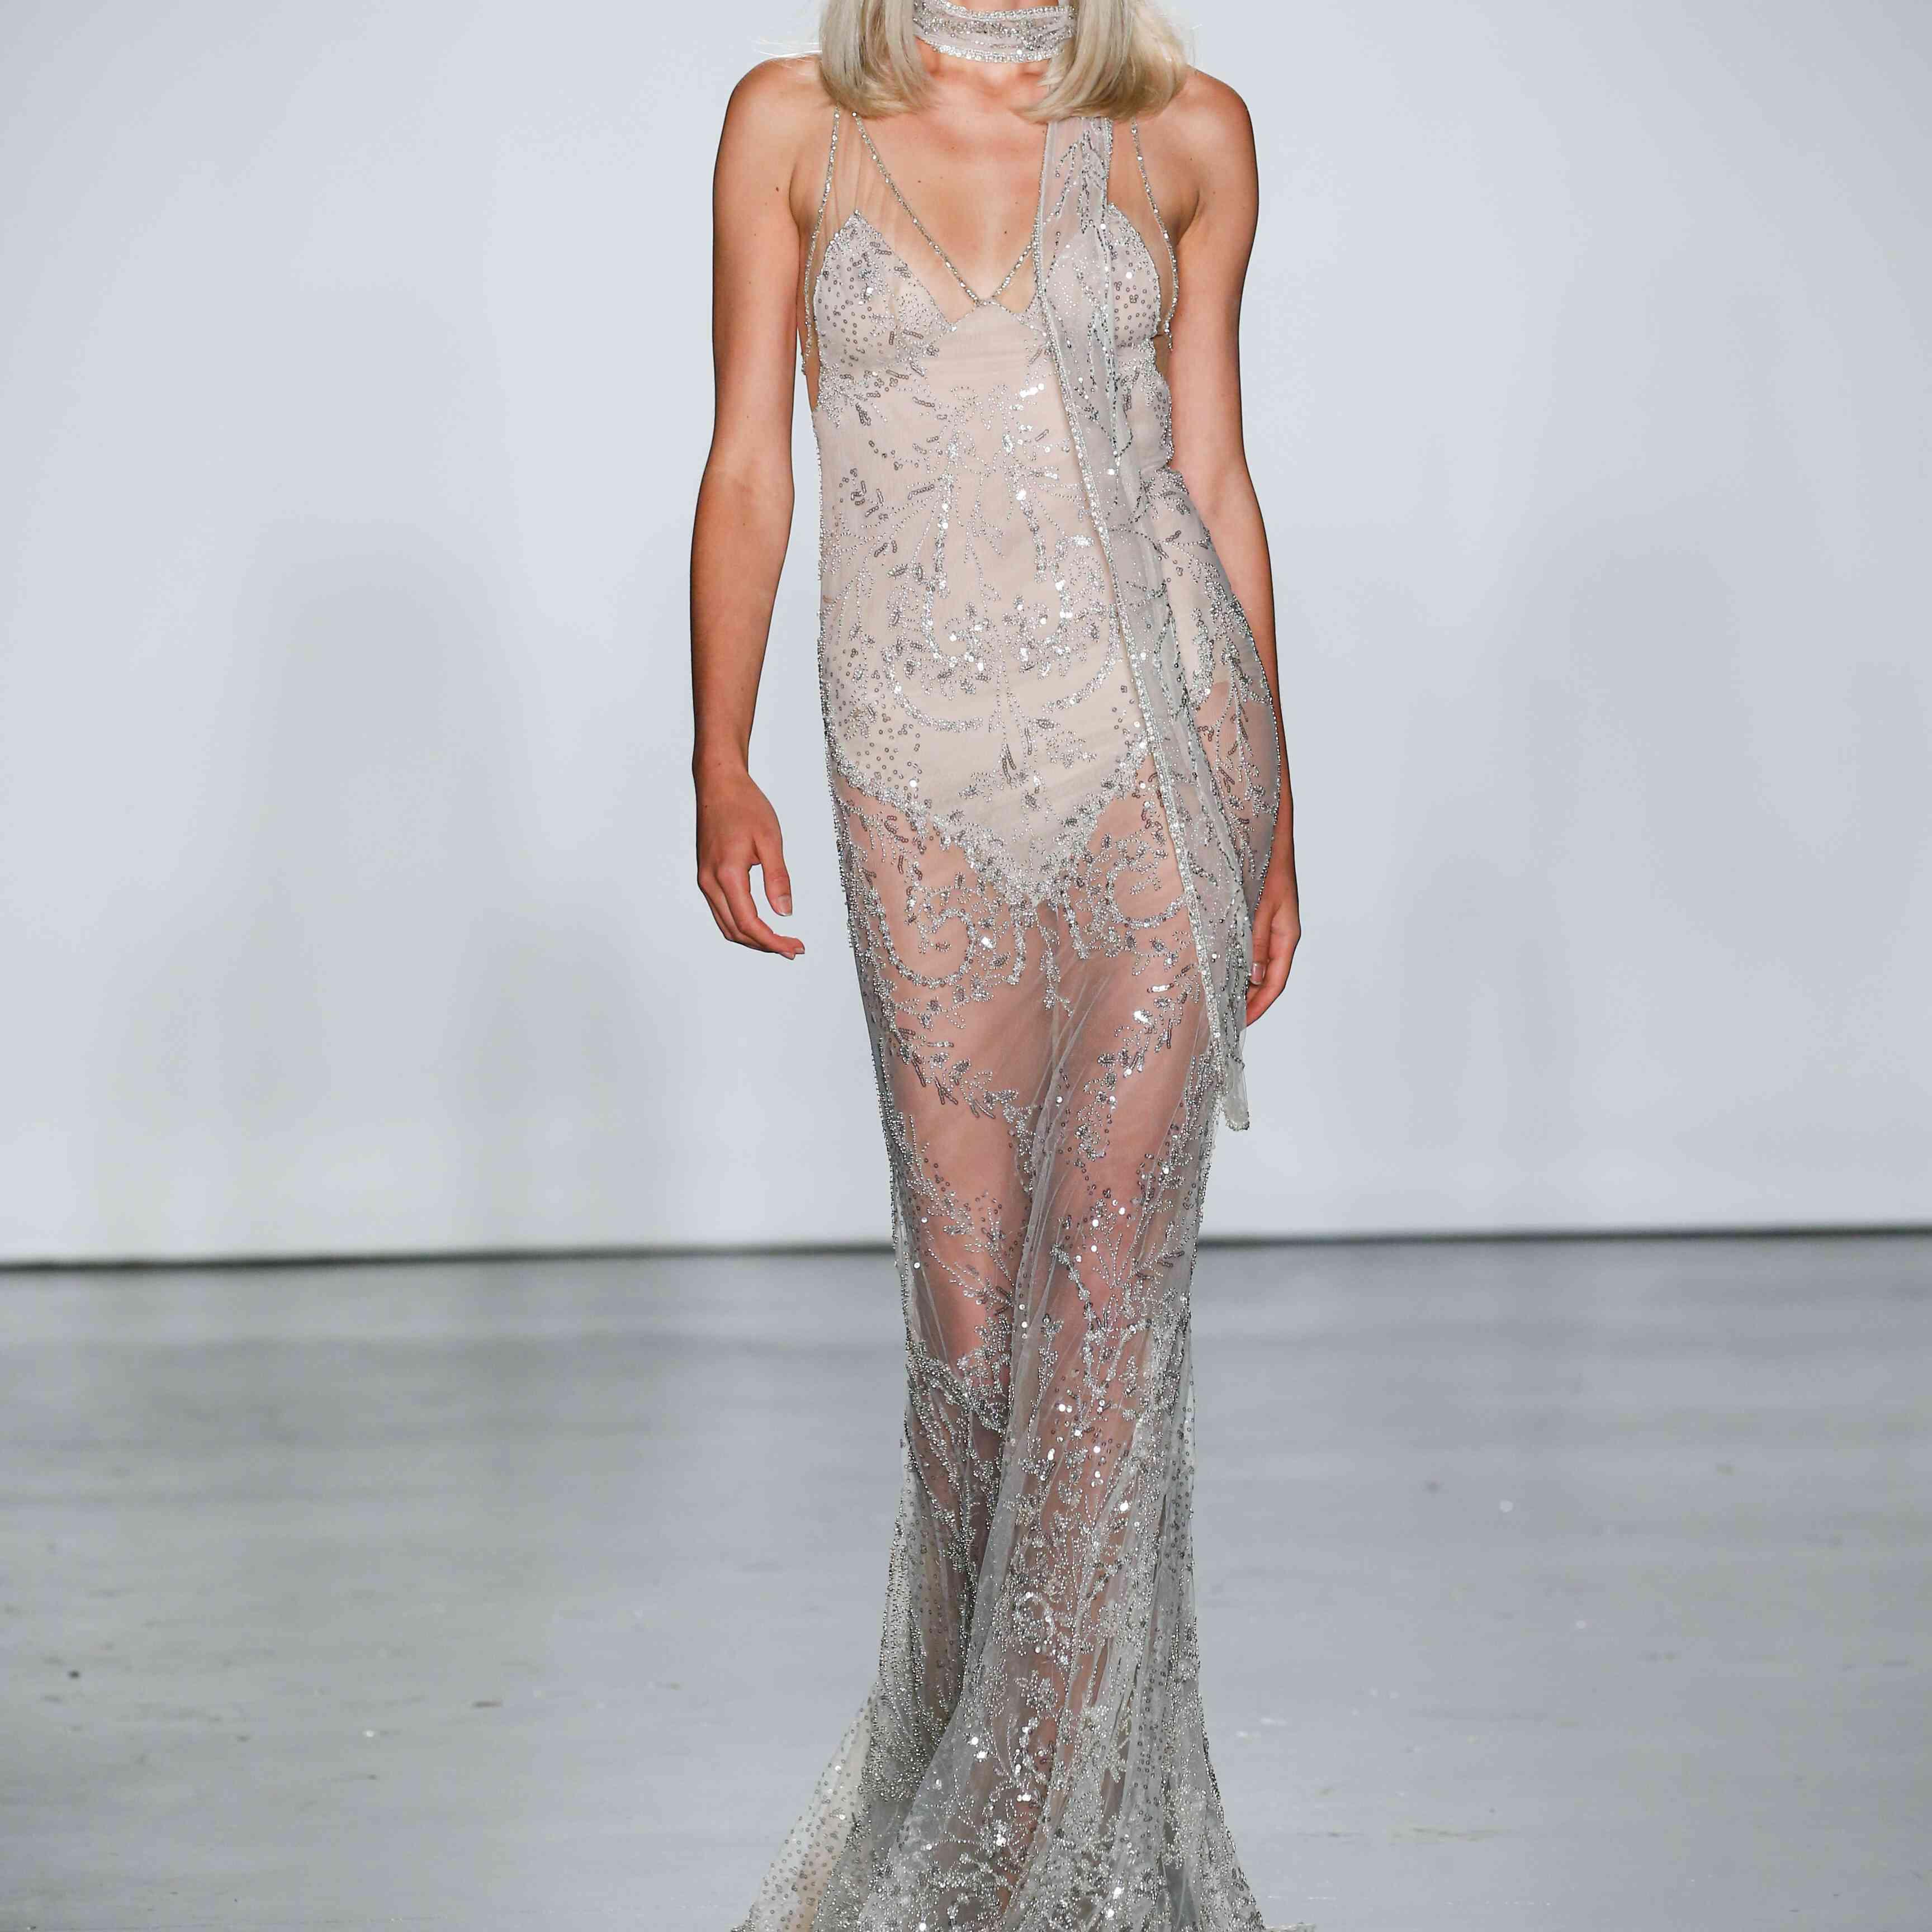 Model in sheer embellished sleeveless wedding dress